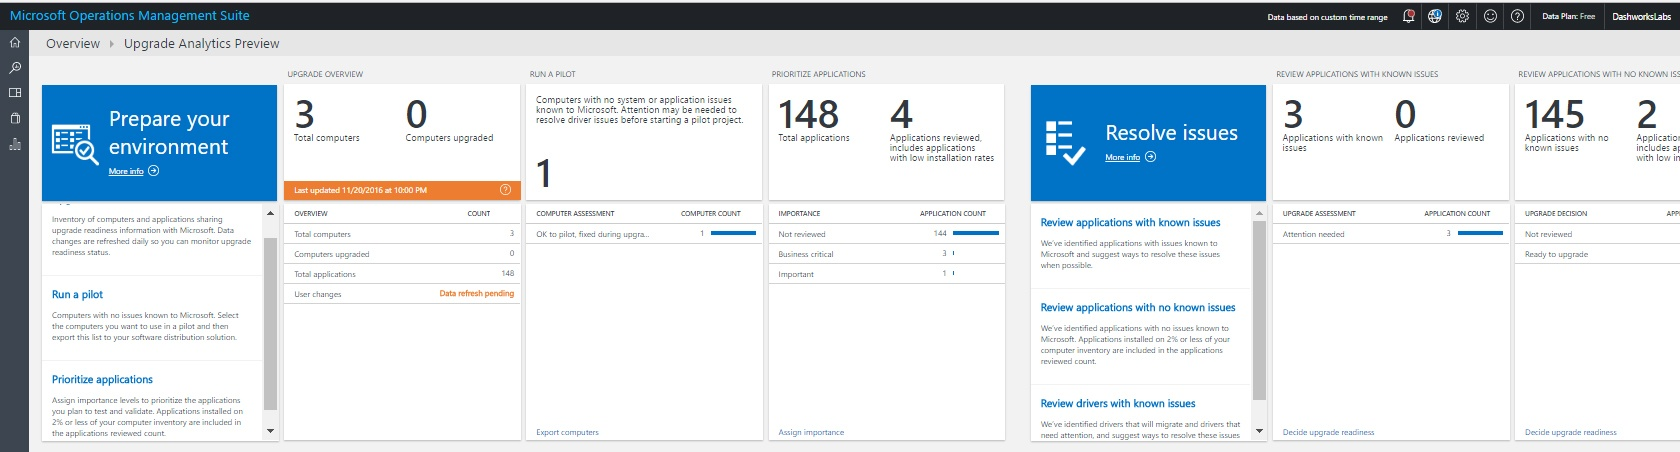 Upgrade Analytics - Readiness Dashboard-1